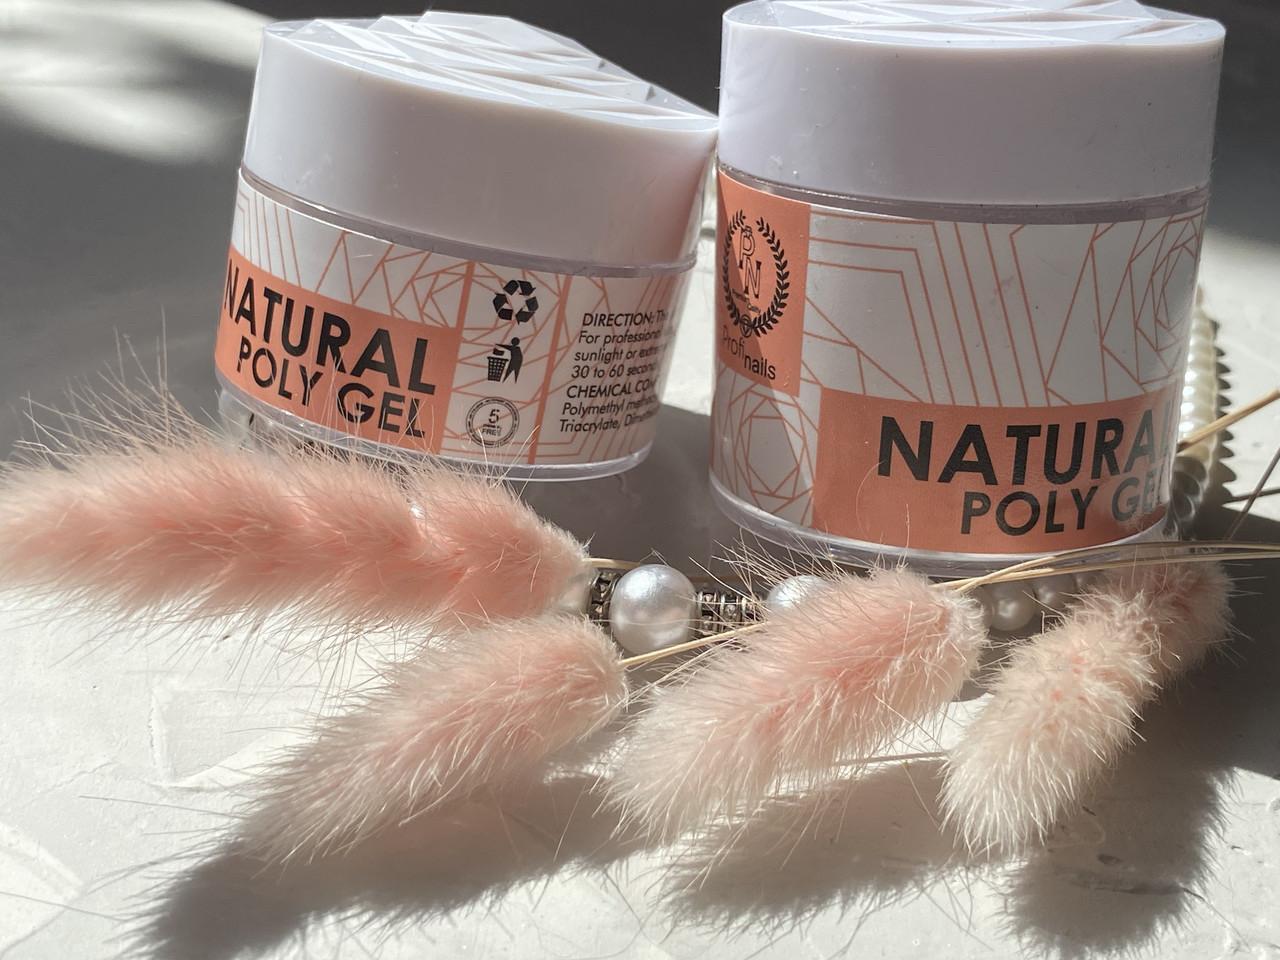 Poly gel natural by Profi nails (поли гель камуфляжный натурал)50ml